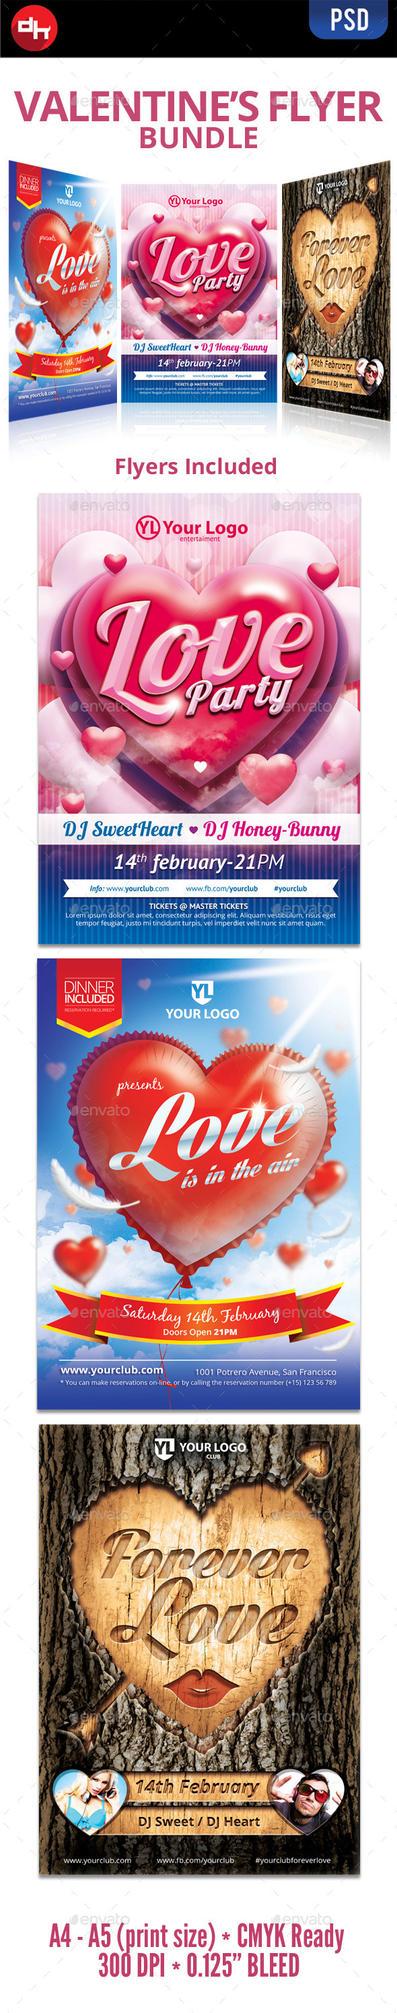 Valentine's Flyer Bundle by doghead